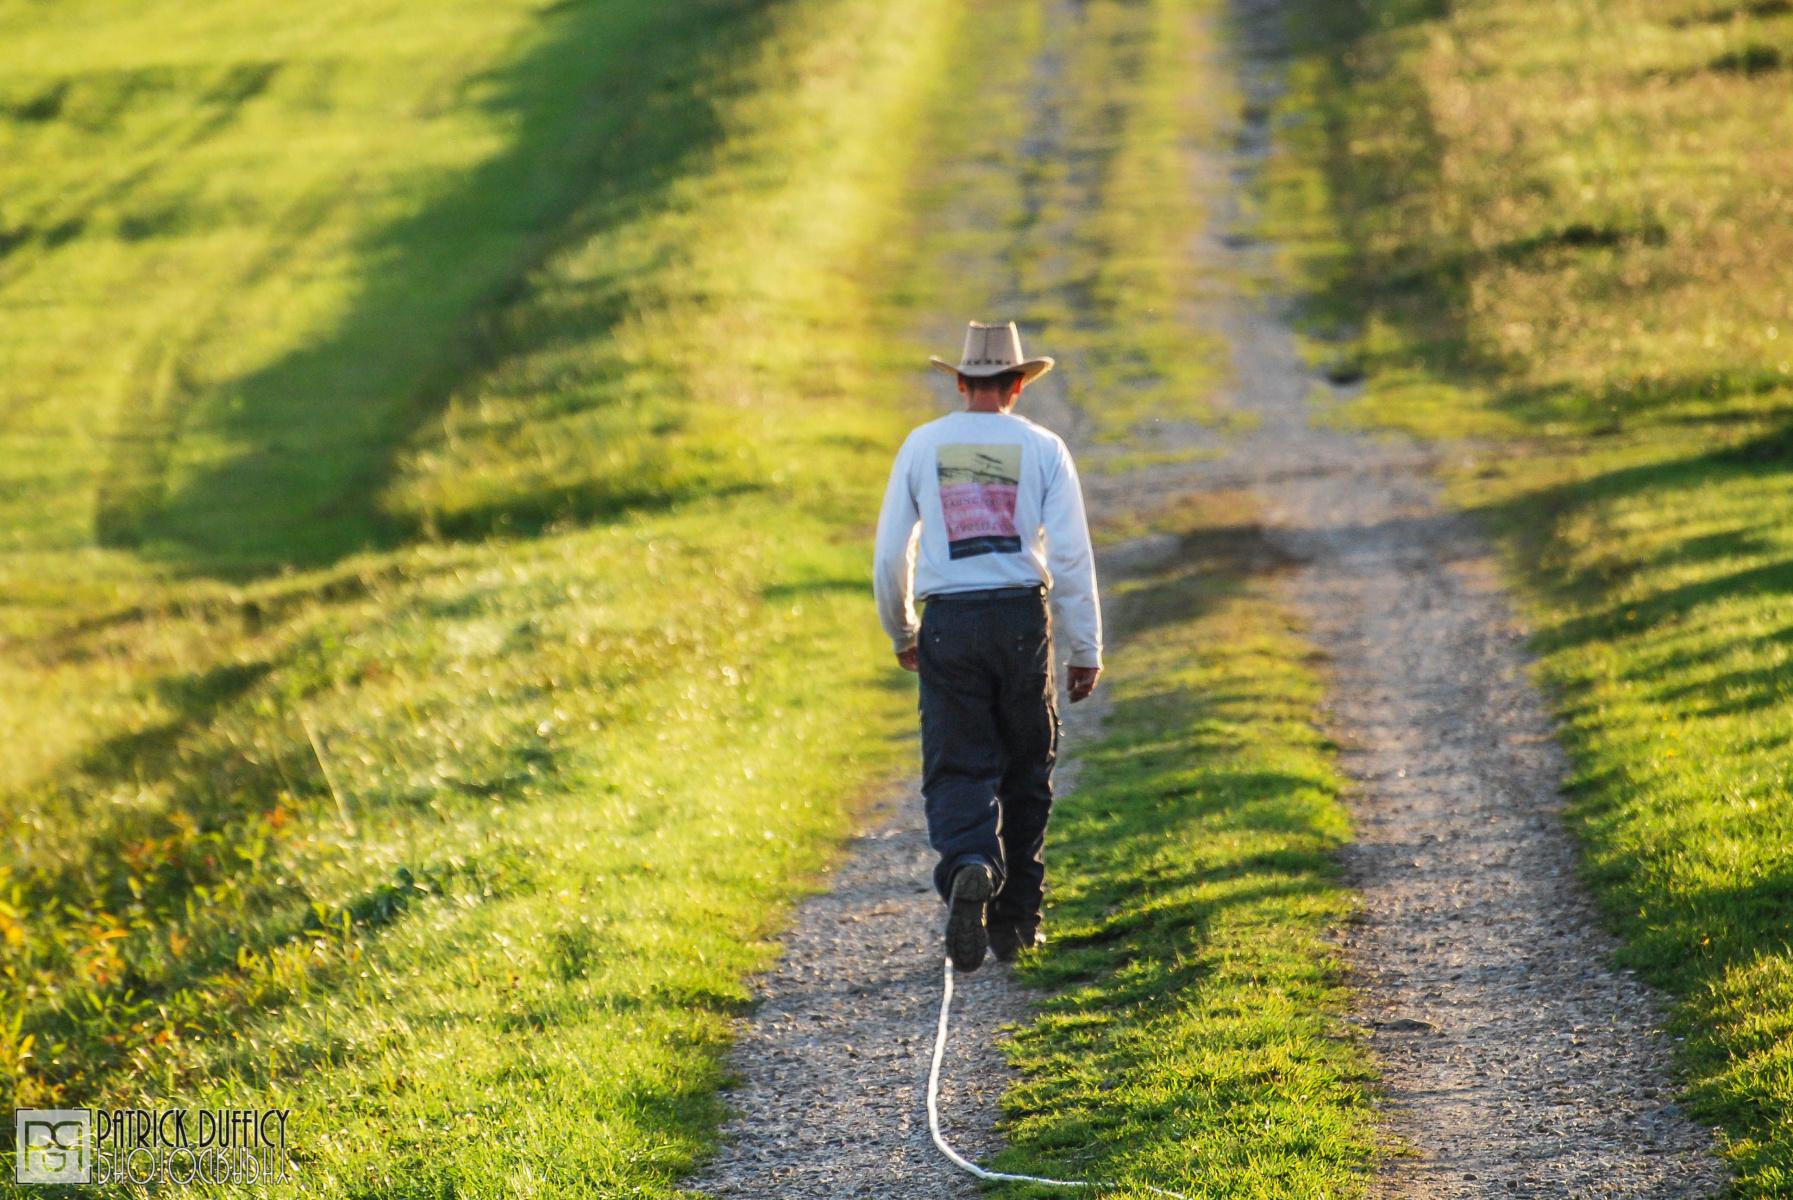 i-walk-alone_16198509306_o